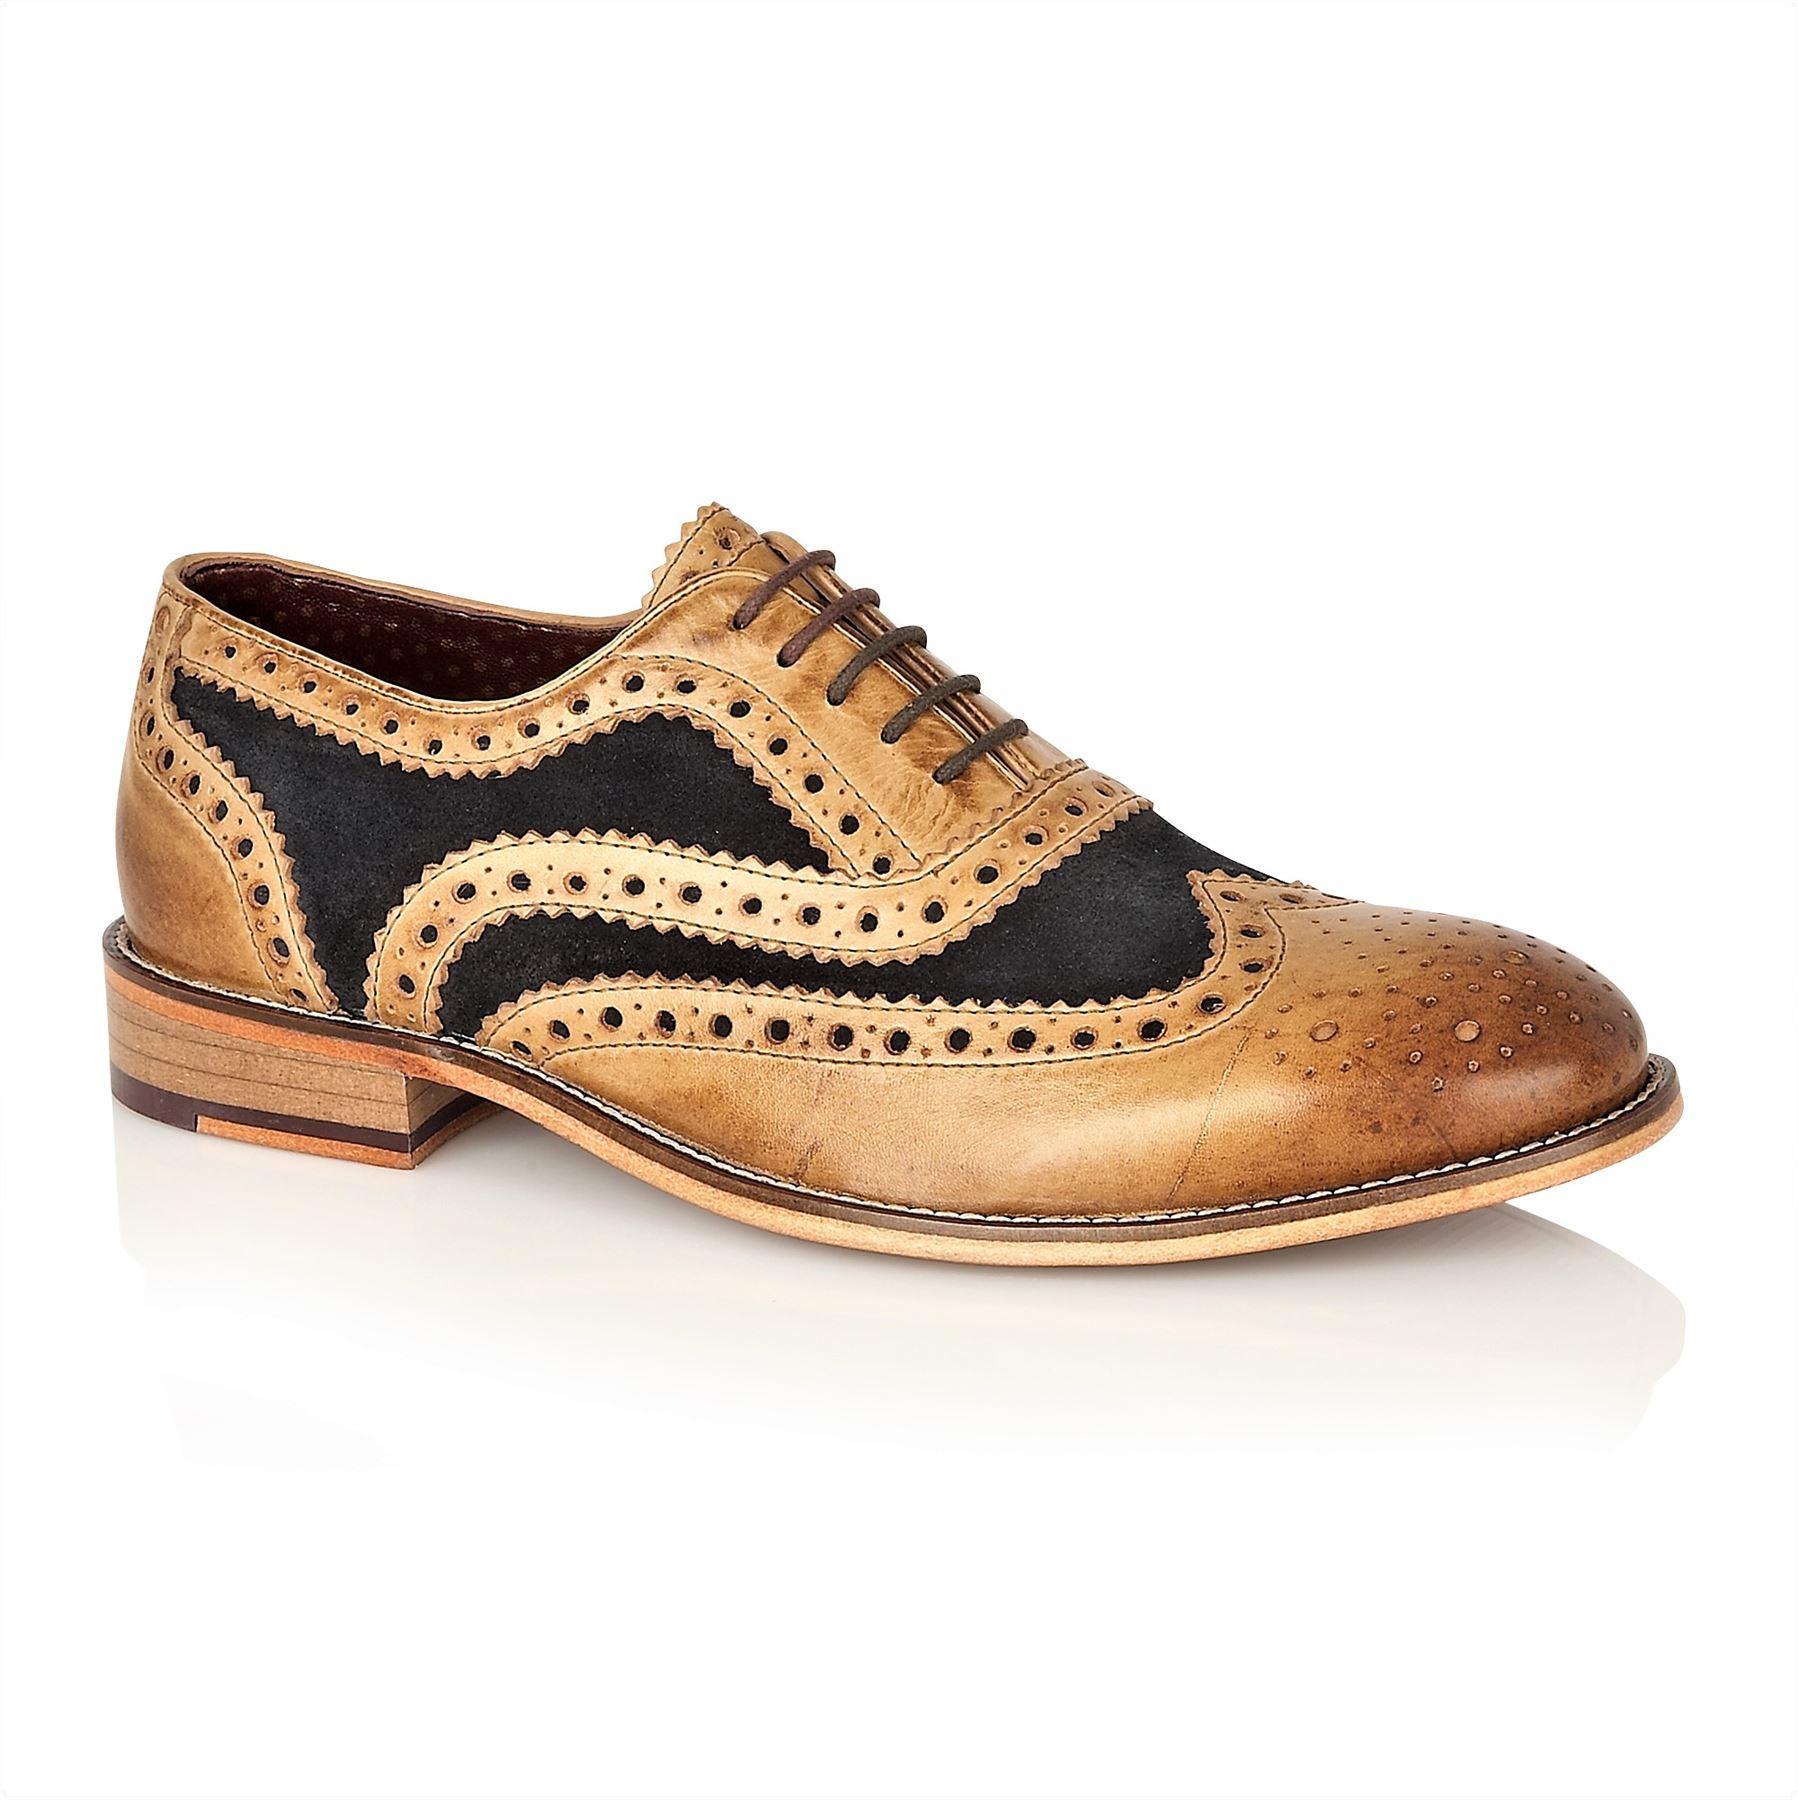 ad81315343c70b London Brogues Watson Ledersohle Herren Schnürschuhe Formal Schuhe ...